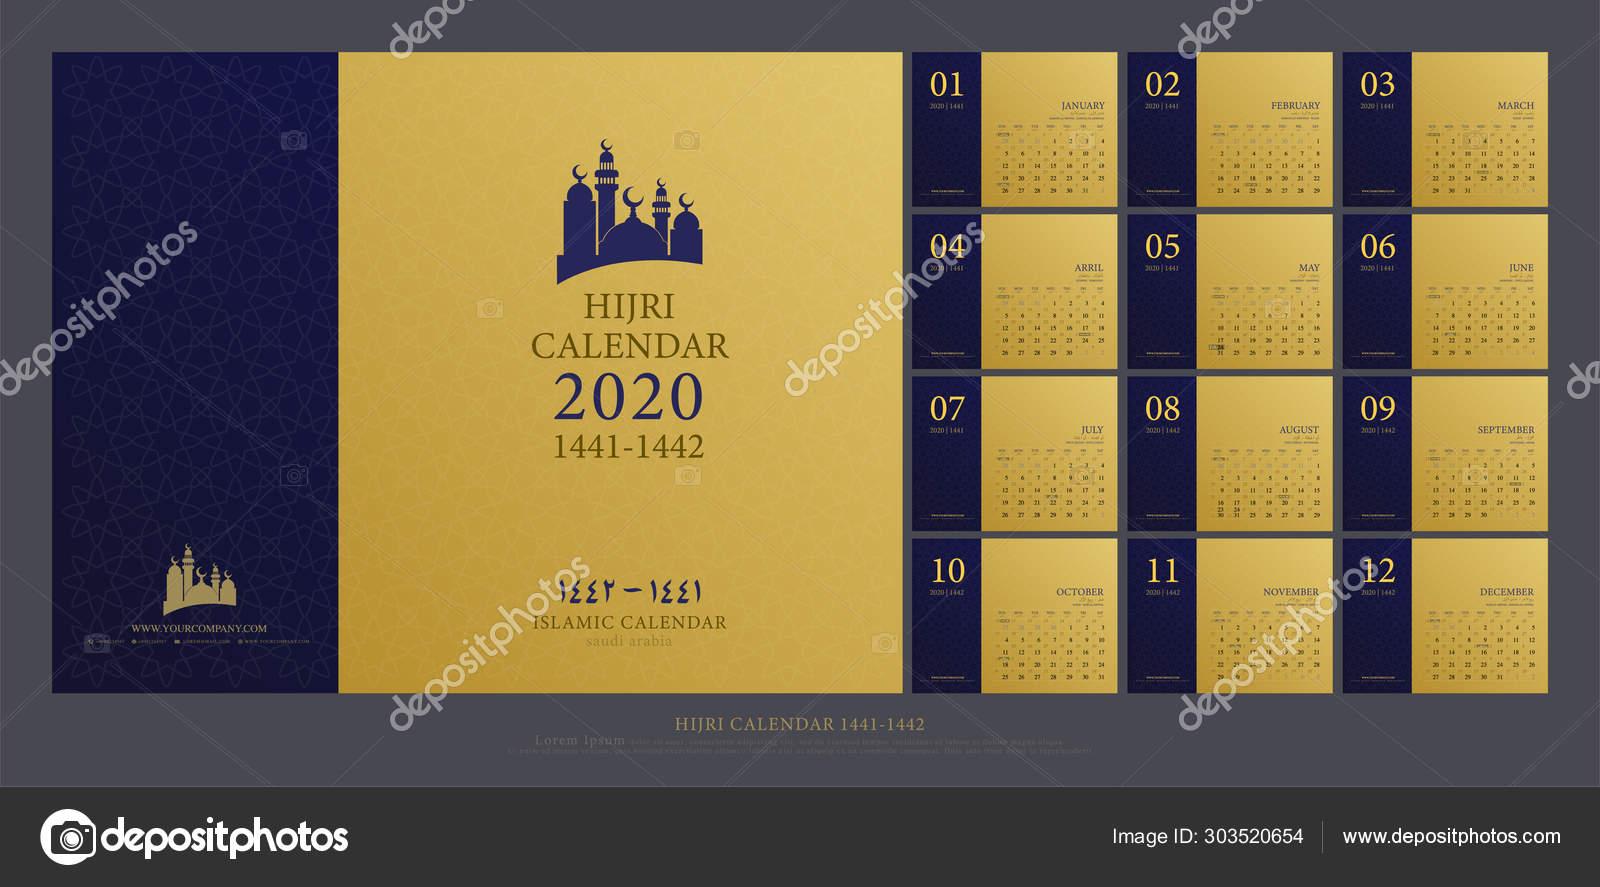 Ramadan calendar 2020 usa